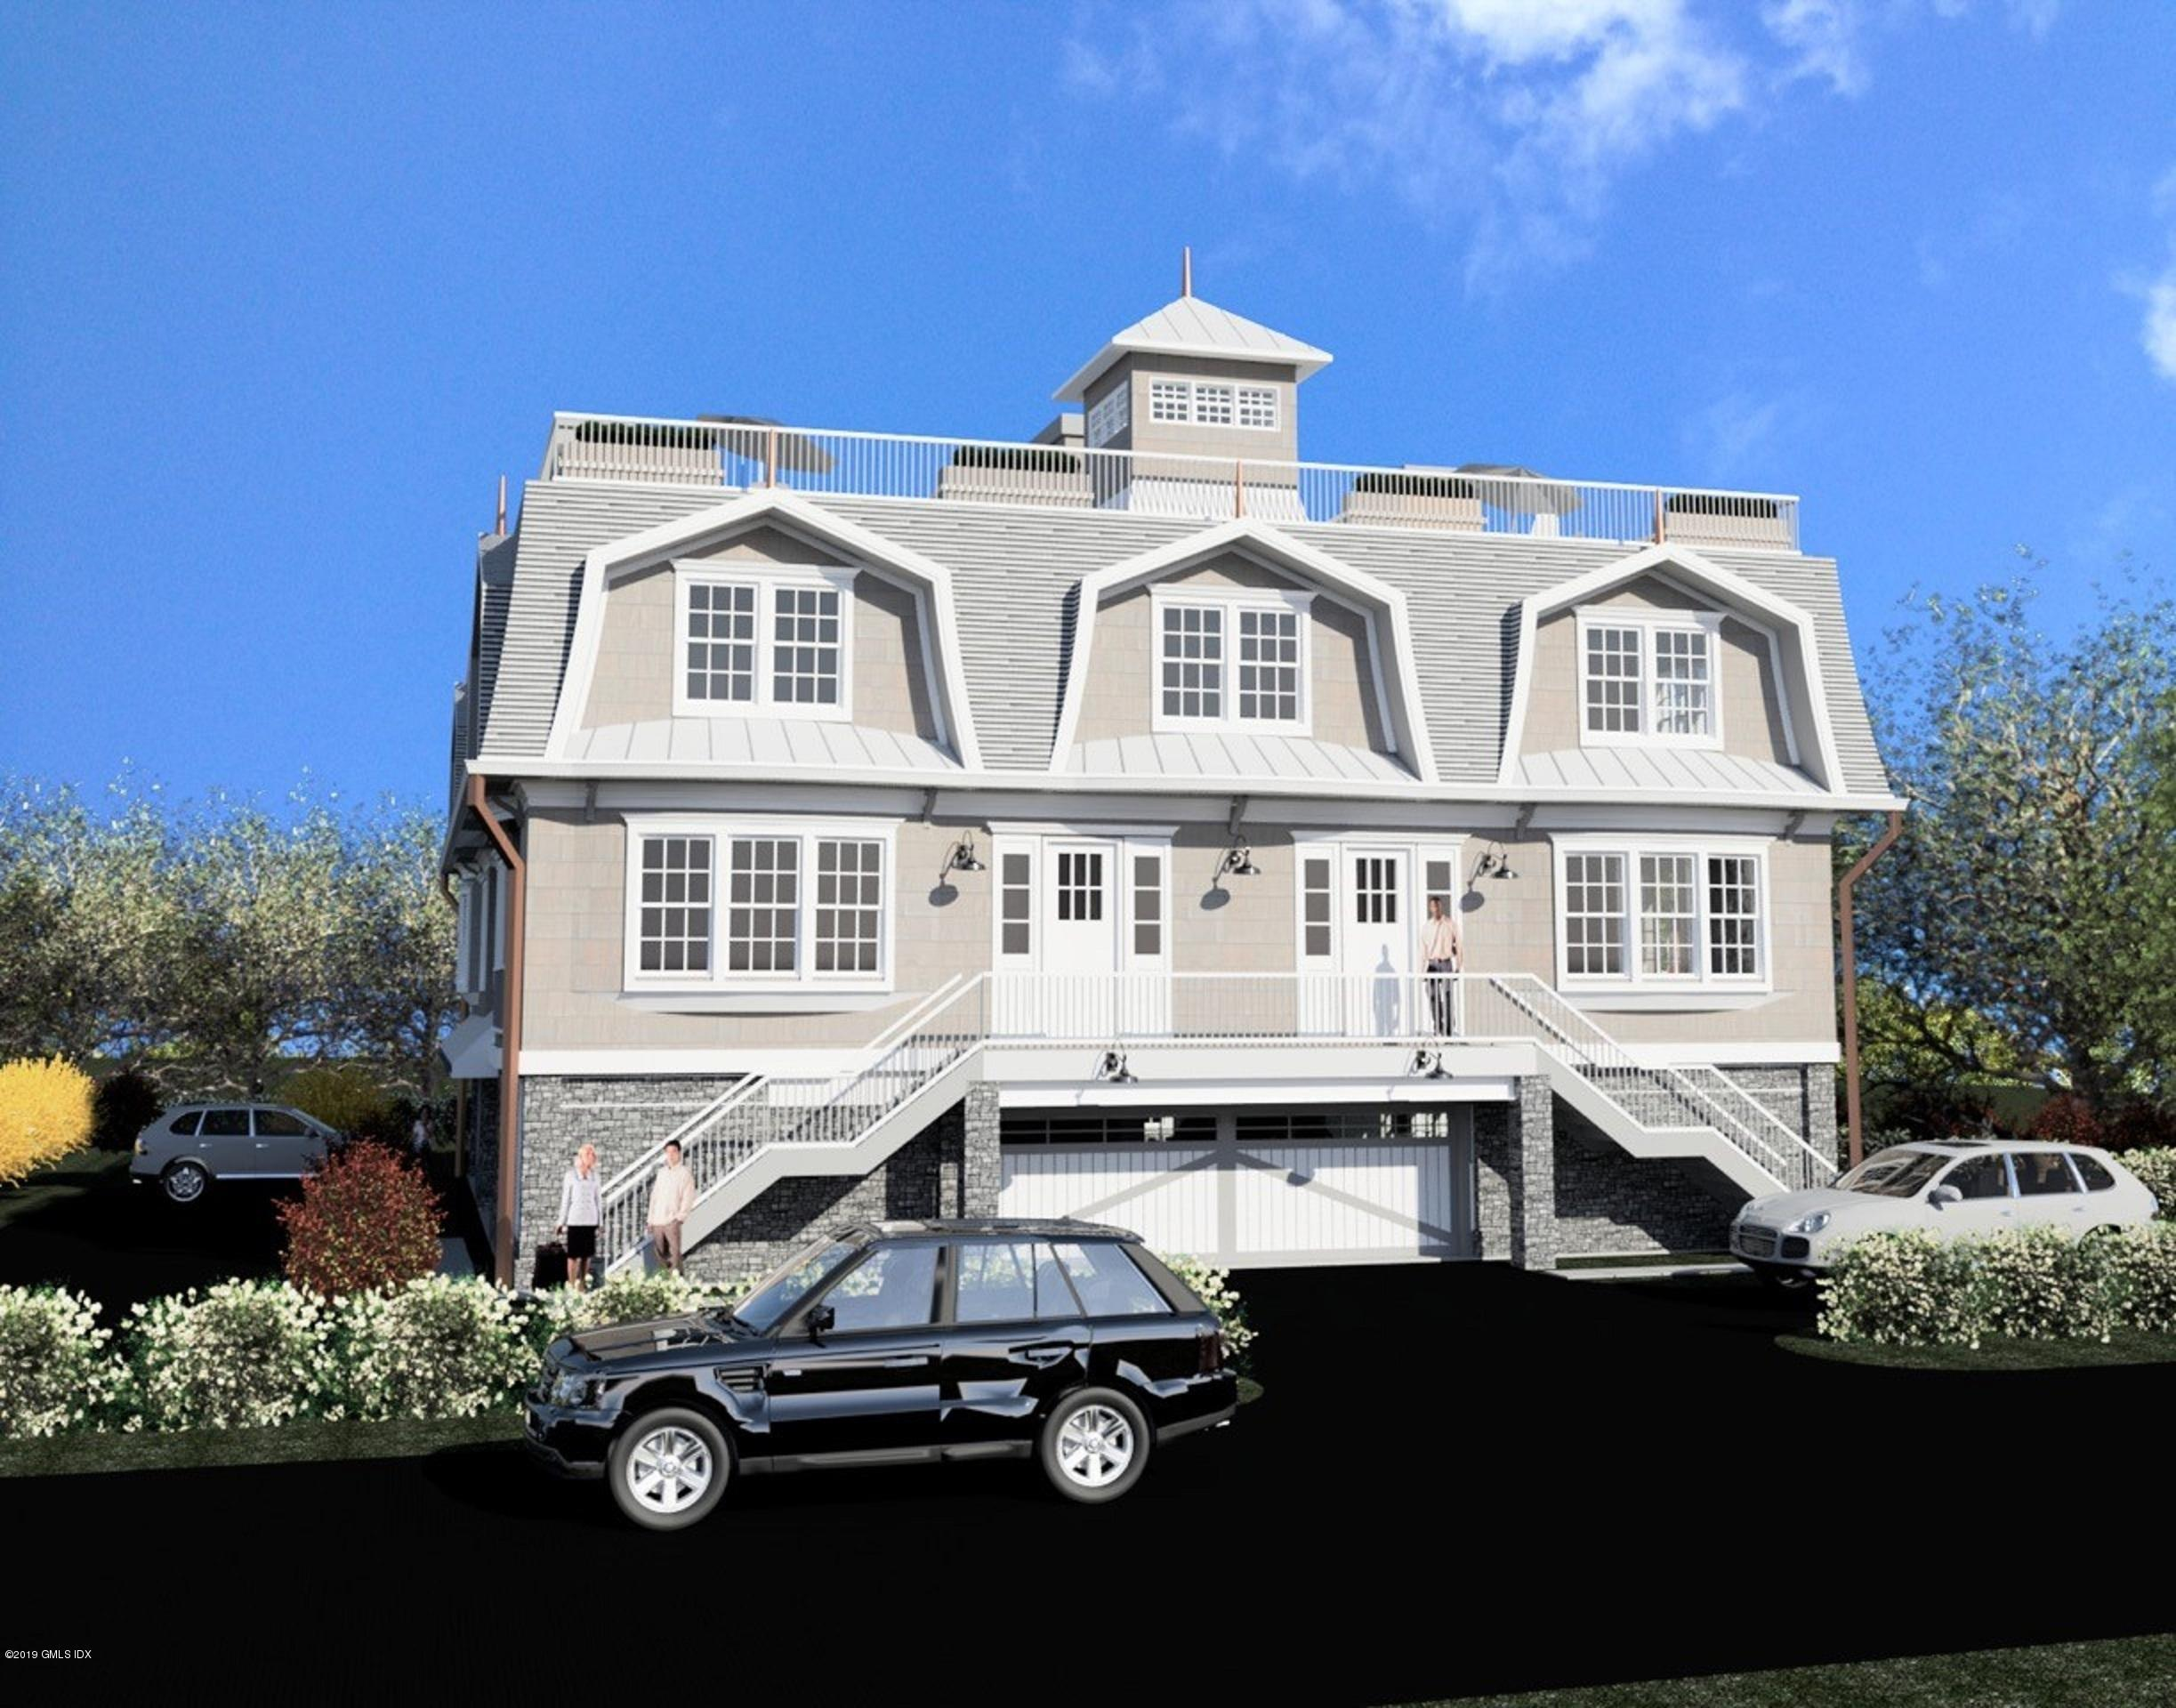 20 Idar Court,Greenwich,Connecticut 06830,3 Bedrooms Bedrooms,3 BathroomsBathrooms,Condominium,Idar,107868